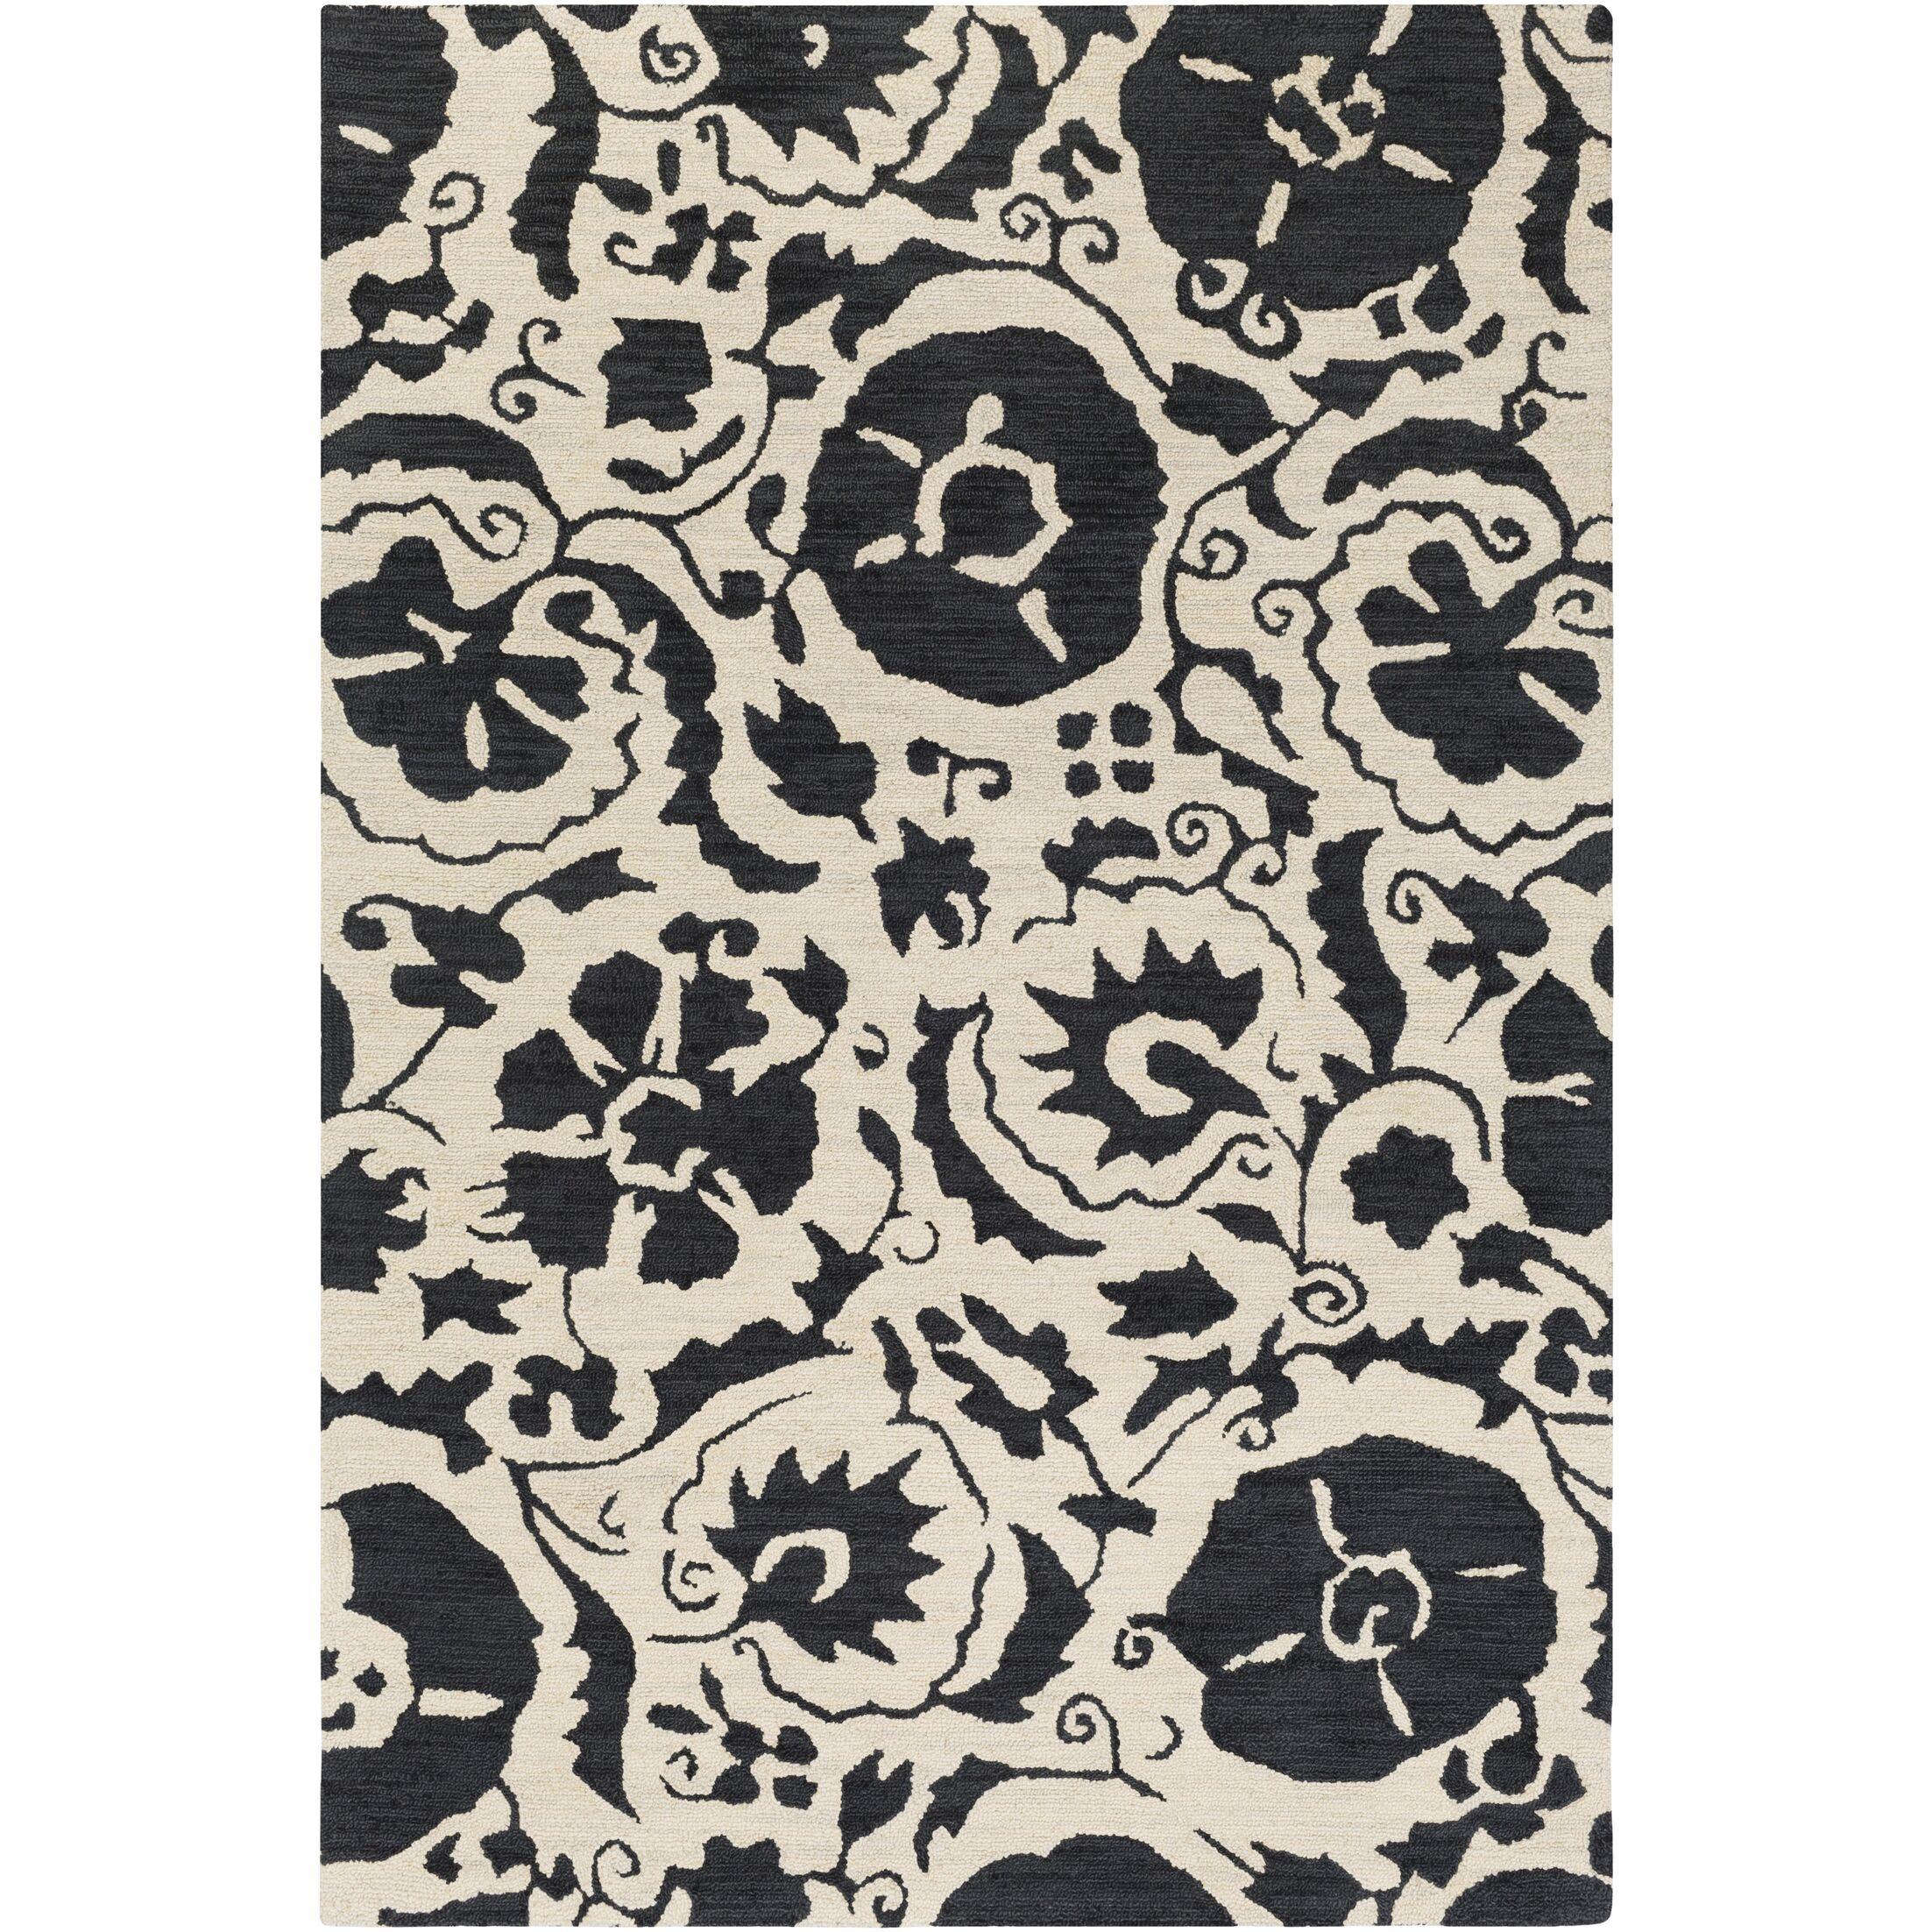 Julie Hand-Tufted Black/Cream Area Rug Rug Size: Rectangle 5' x 7'6